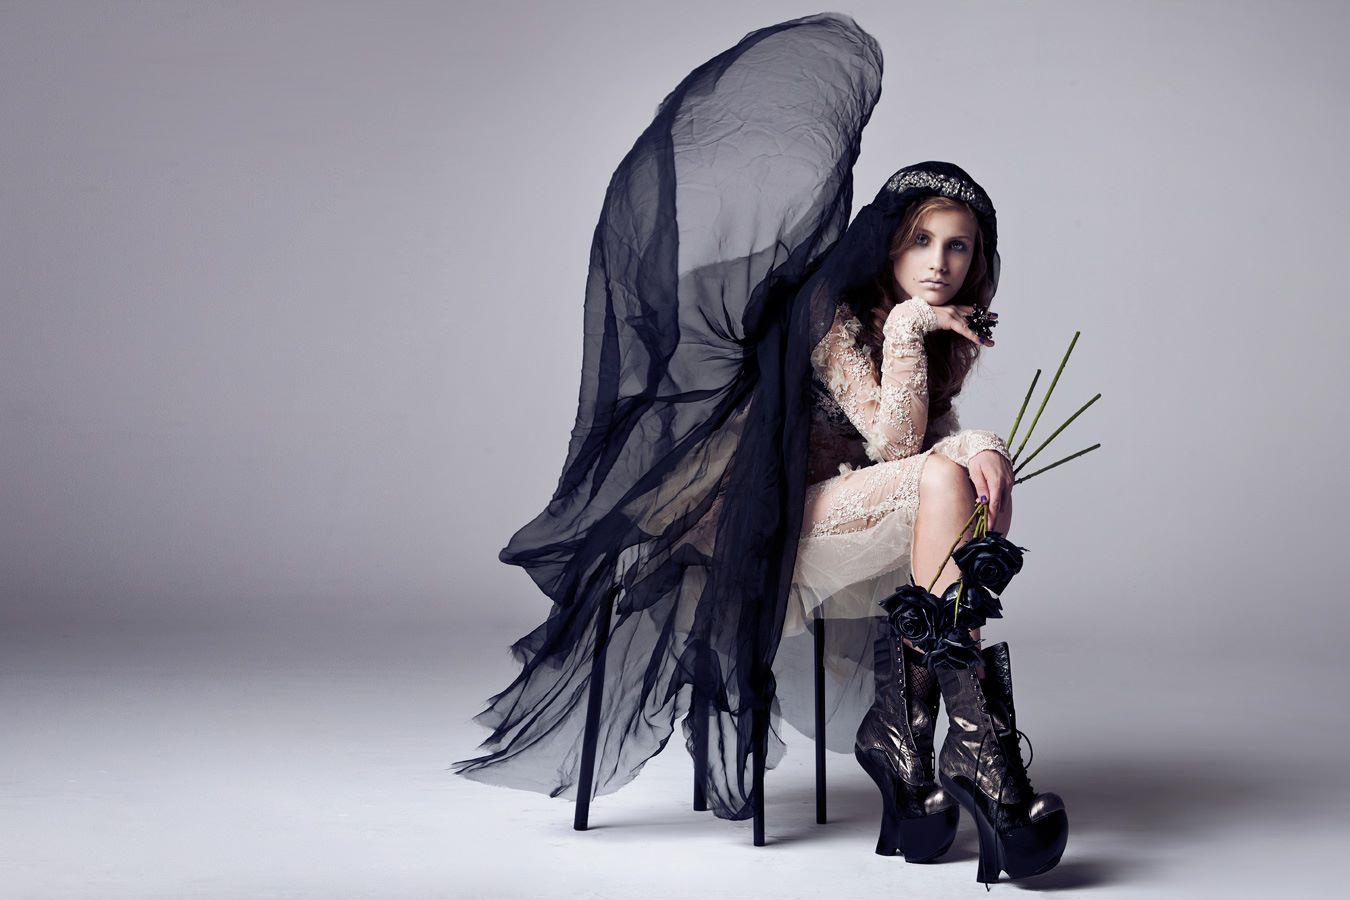 photo : Maciej Bernas<br /> styling & make up: Boom Team<br /> model: Julie/ GaGa